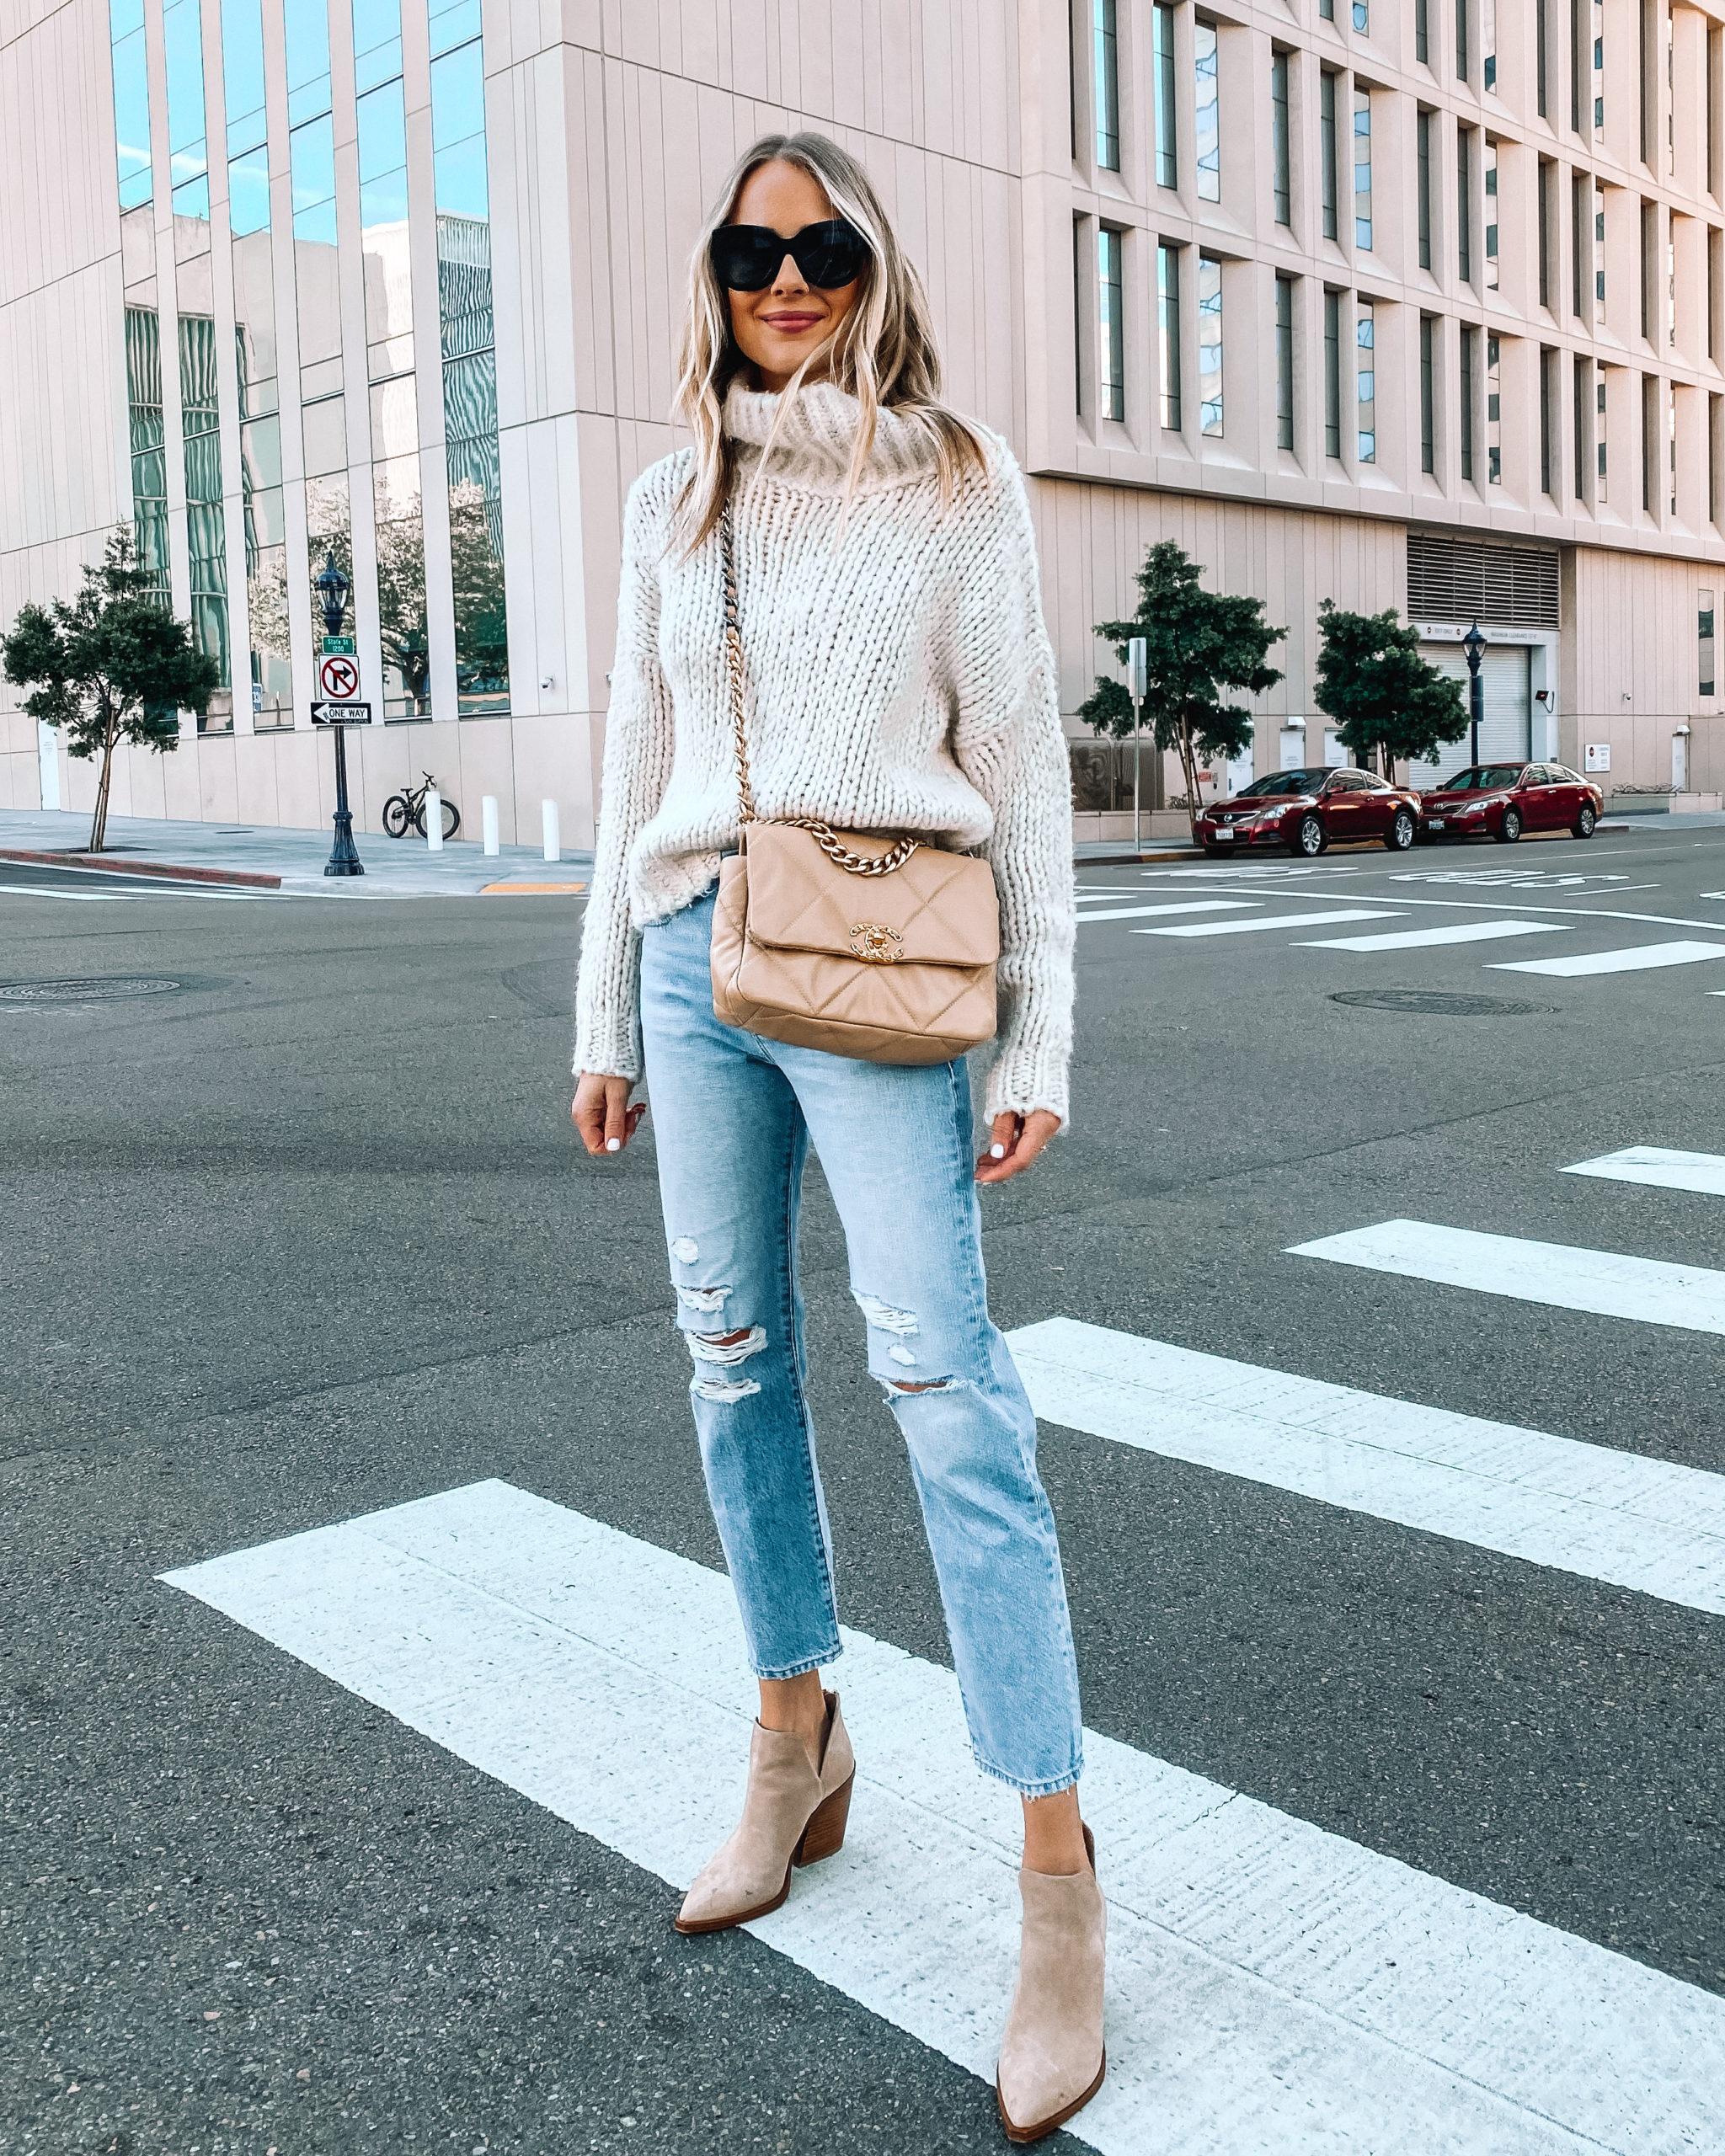 Fashion Jackson Wearing Beige Turtleneck Oversized Knit Sweater Ripped Jeans Tan Booties Chanel 19 Handbag